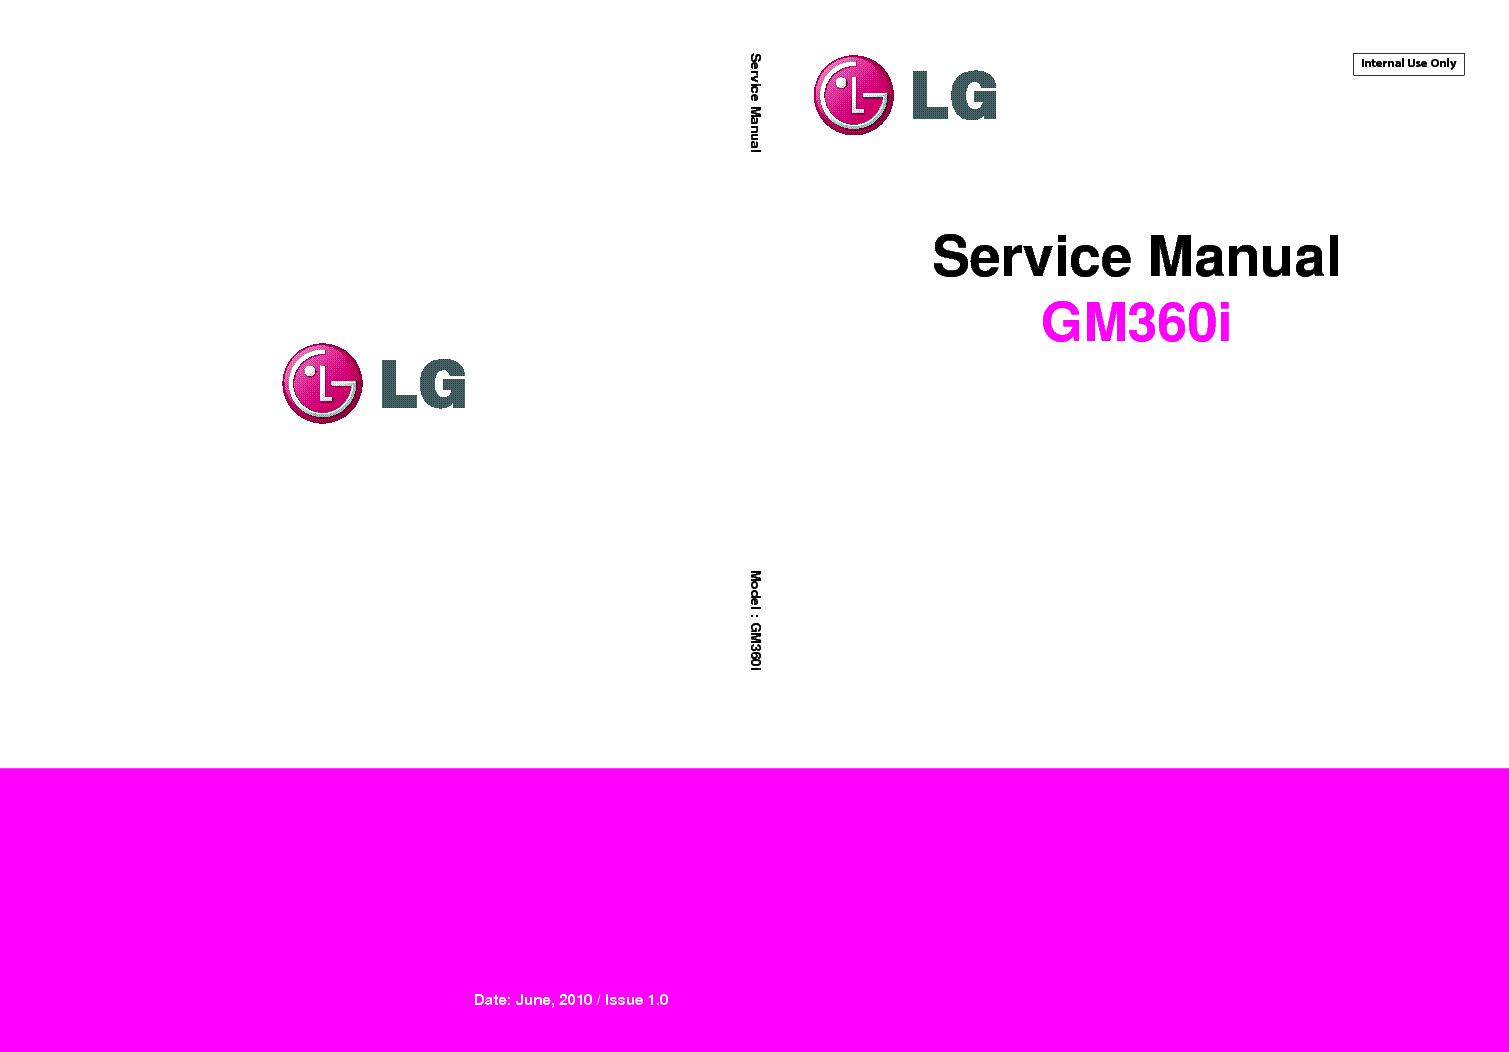 lg gm360i service manual download schematics eeprom repair info rh elektrotanya com LG Cell Phone Manuals LG GS170 Manual